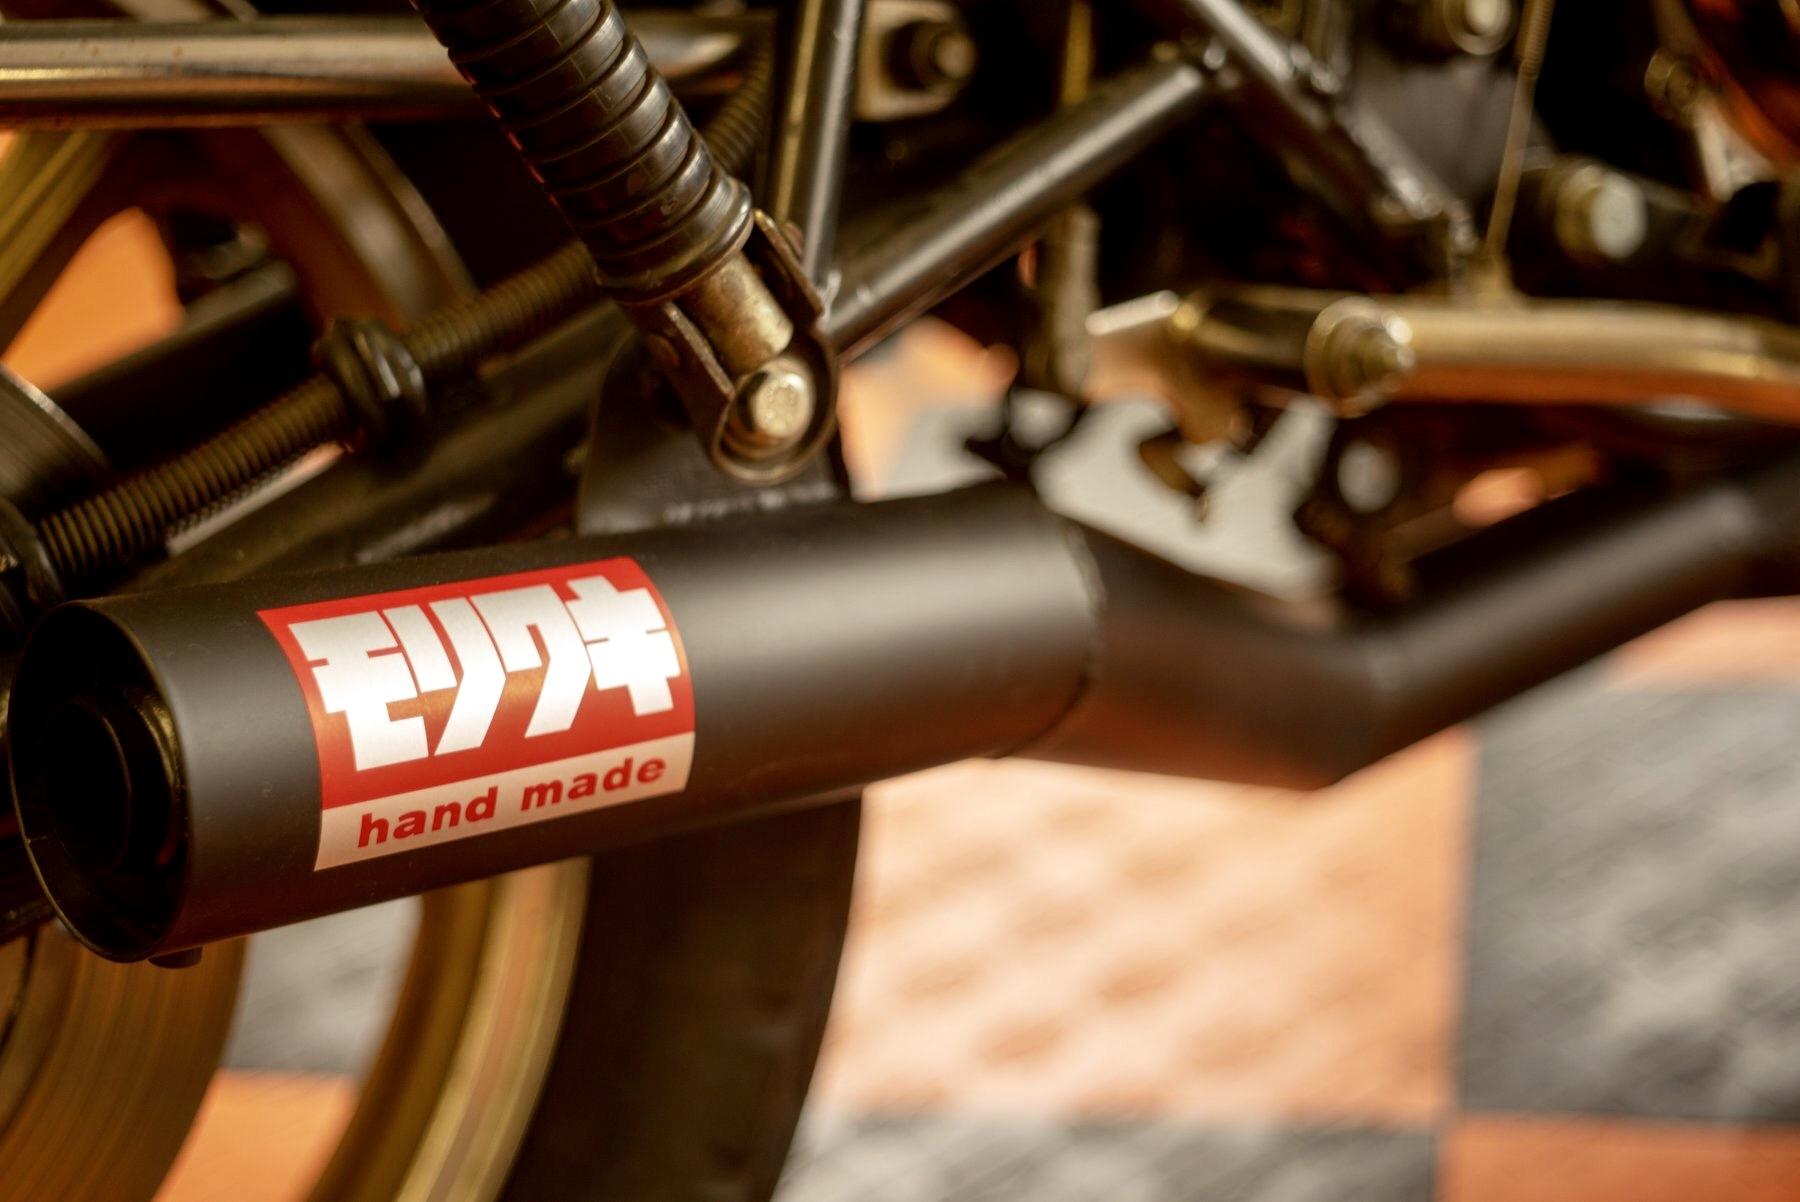 【NEWS!】お盆前にモリワキ復刻 Z400FX手曲げショート管が到着します!_d0246961_17492700.jpg